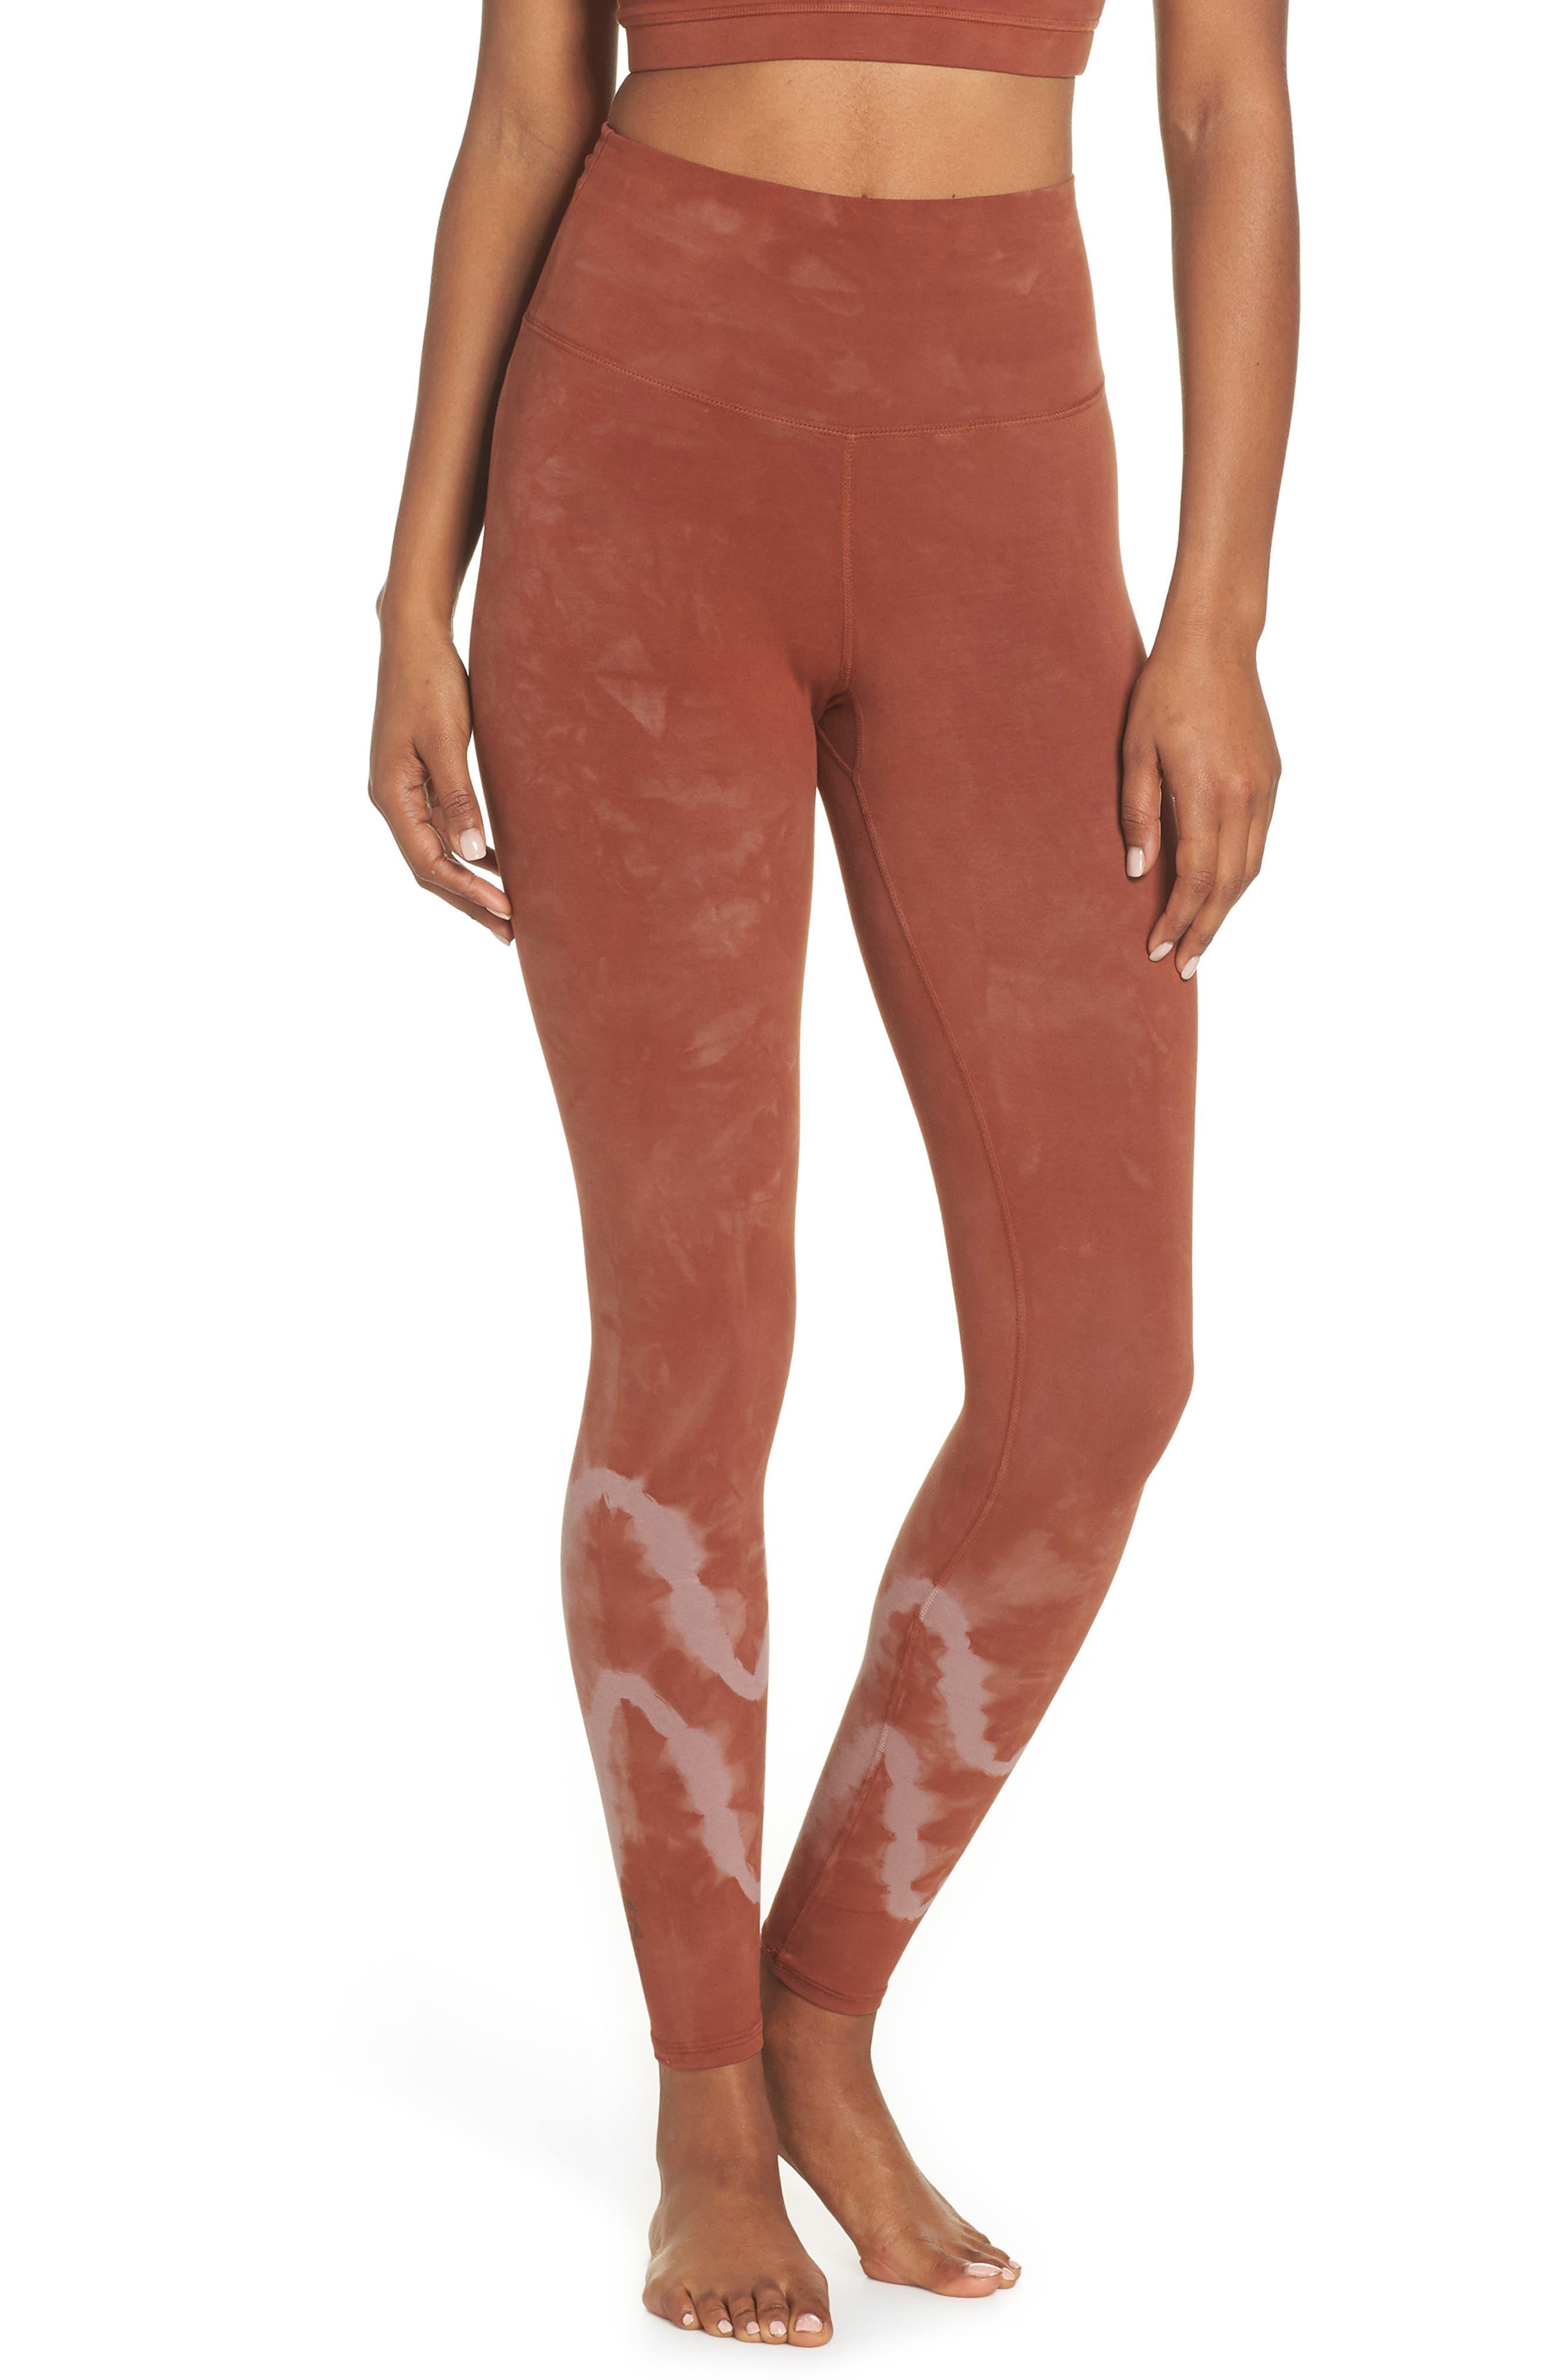 ELECTRIC & ROSE Sunset Tie Dye Leggings in Chevron Wash Fox / Mauve